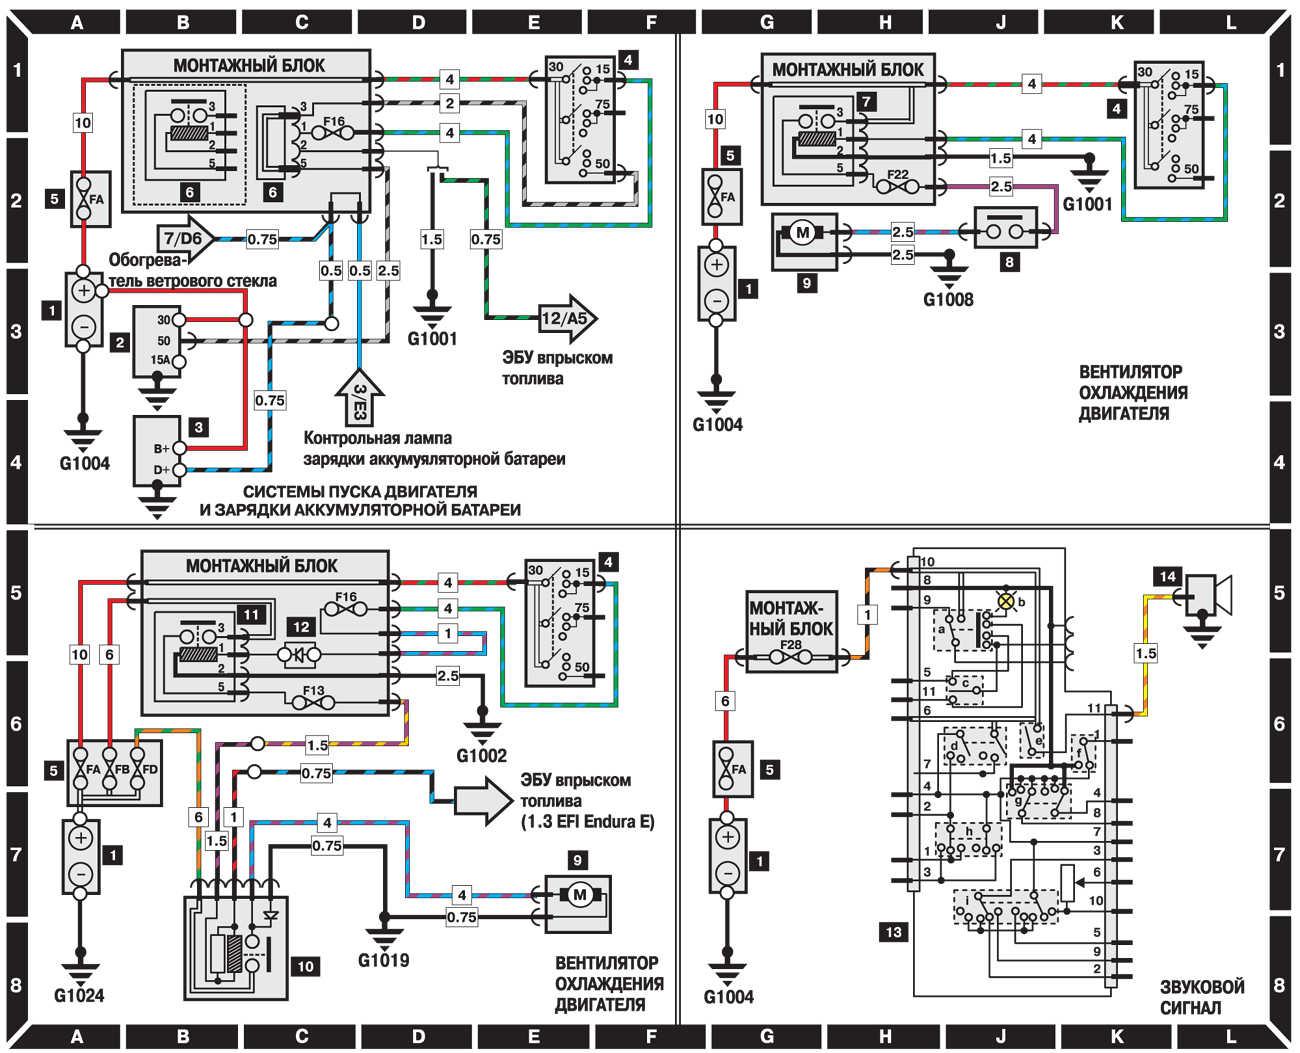 Схема зажигания форд эскорт